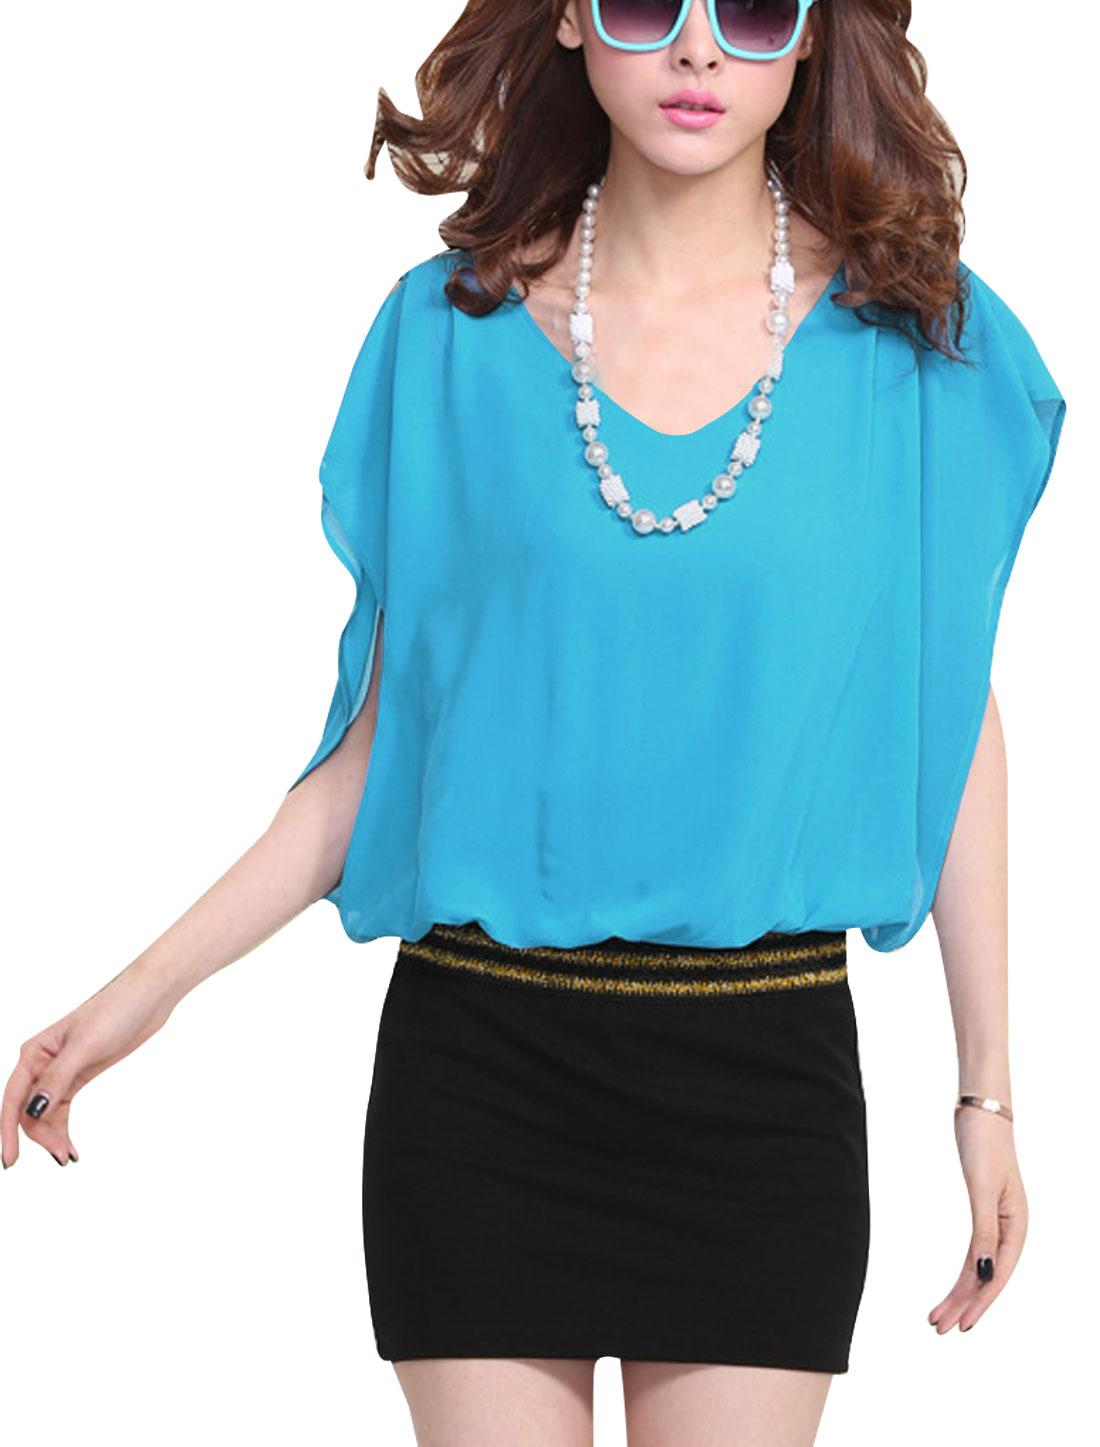 Women Glitter Detail Chiffon Splicing Elegant Dress Light Blue M